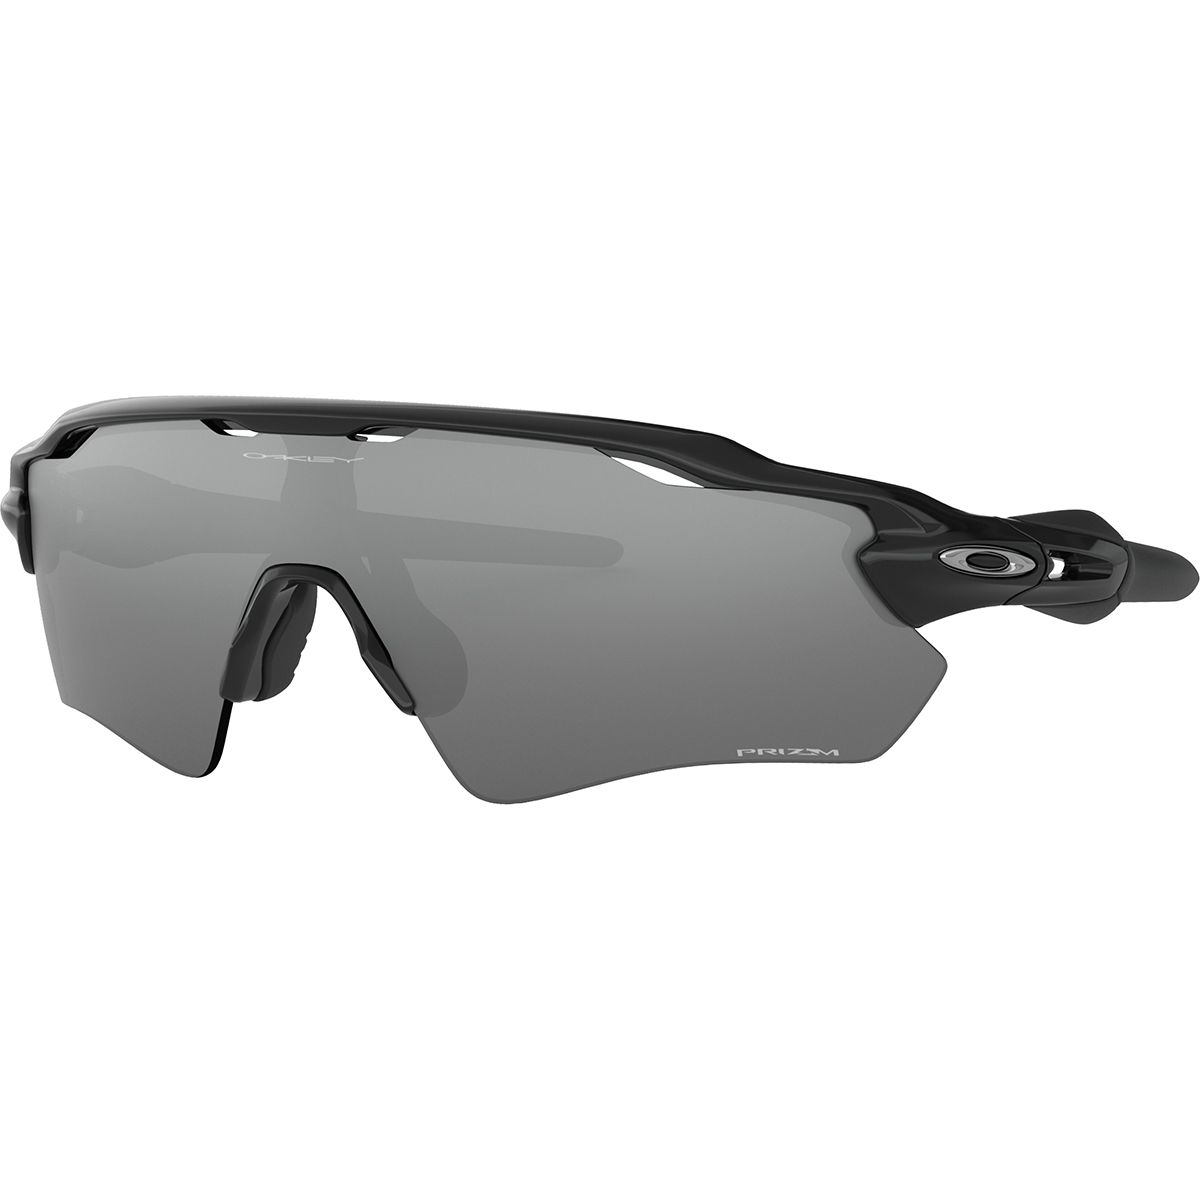 fd32becc62 Oakley Radar Ev Path Prizm Road Cycling Sunglasses